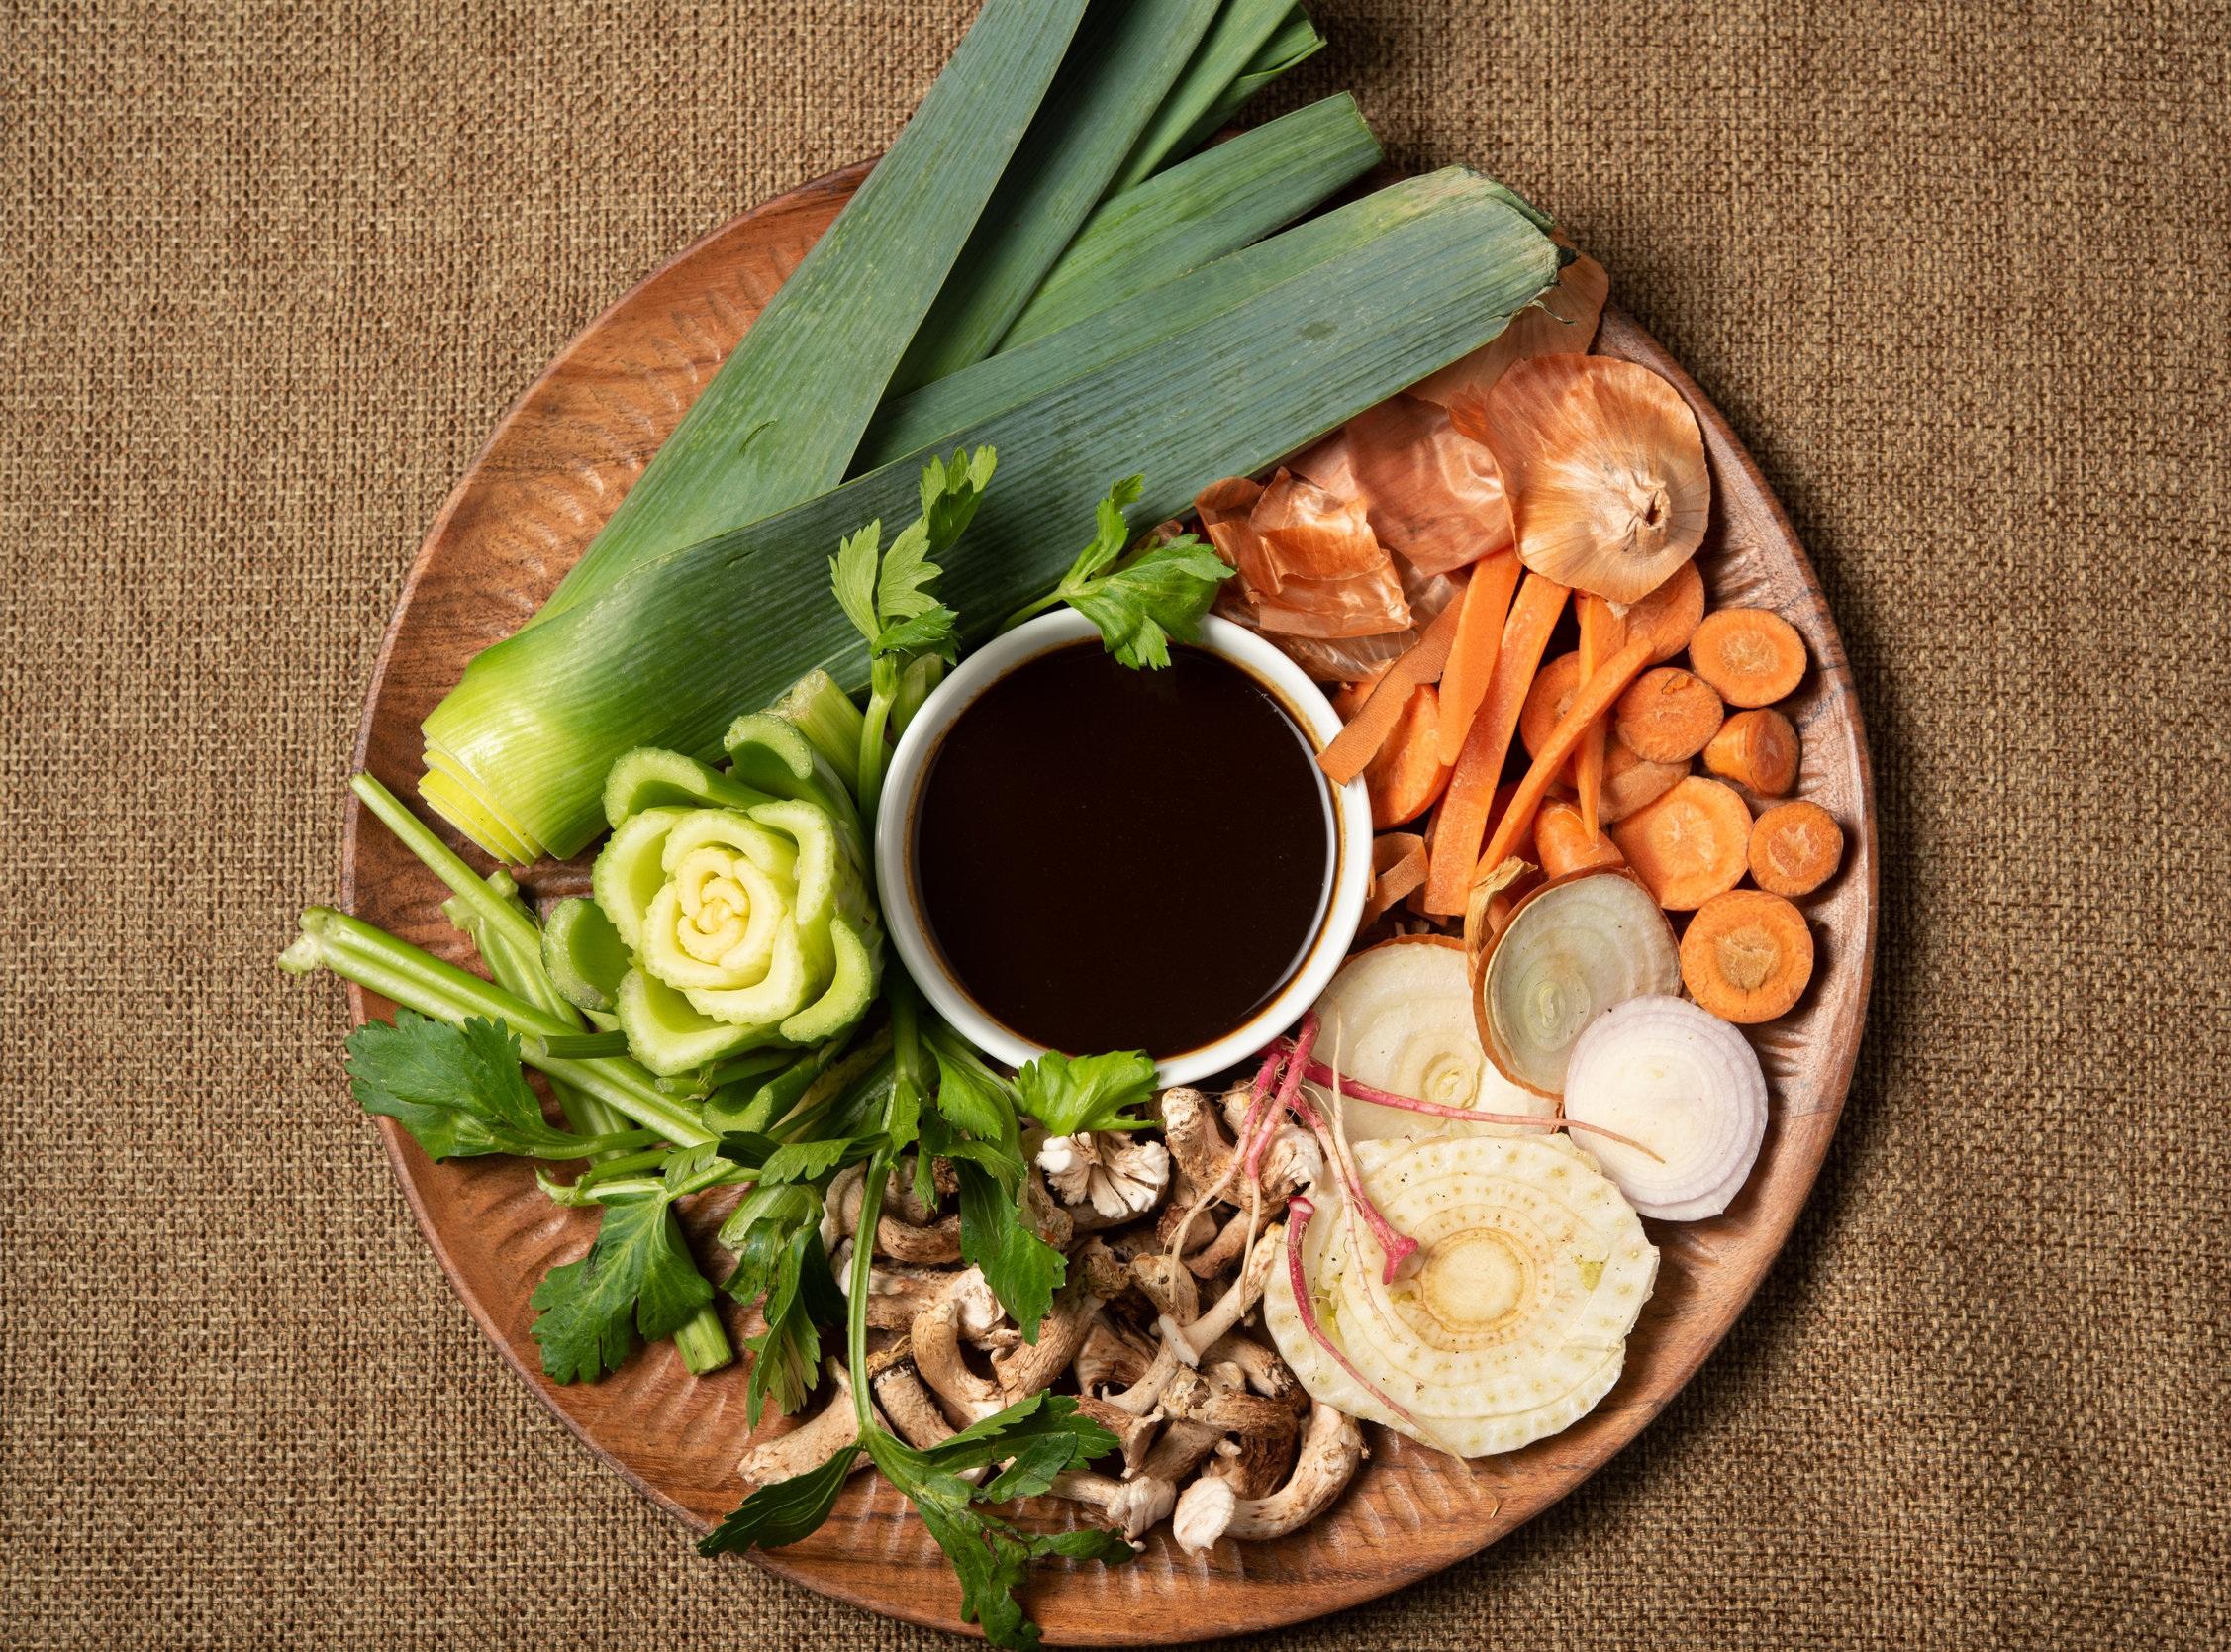 Vegan Demi Glace Ingredients; Photo Credit: ©Chip Klose